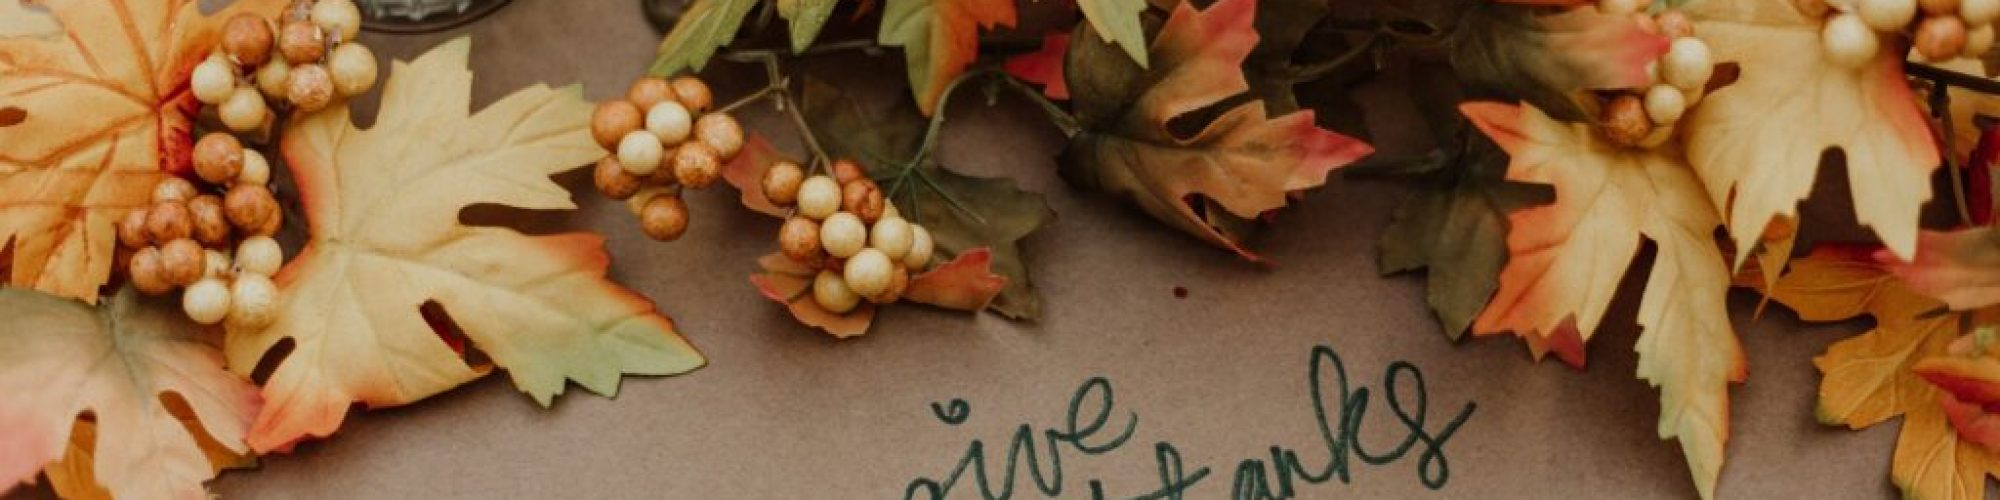 thanksgiving-feast-1024x683